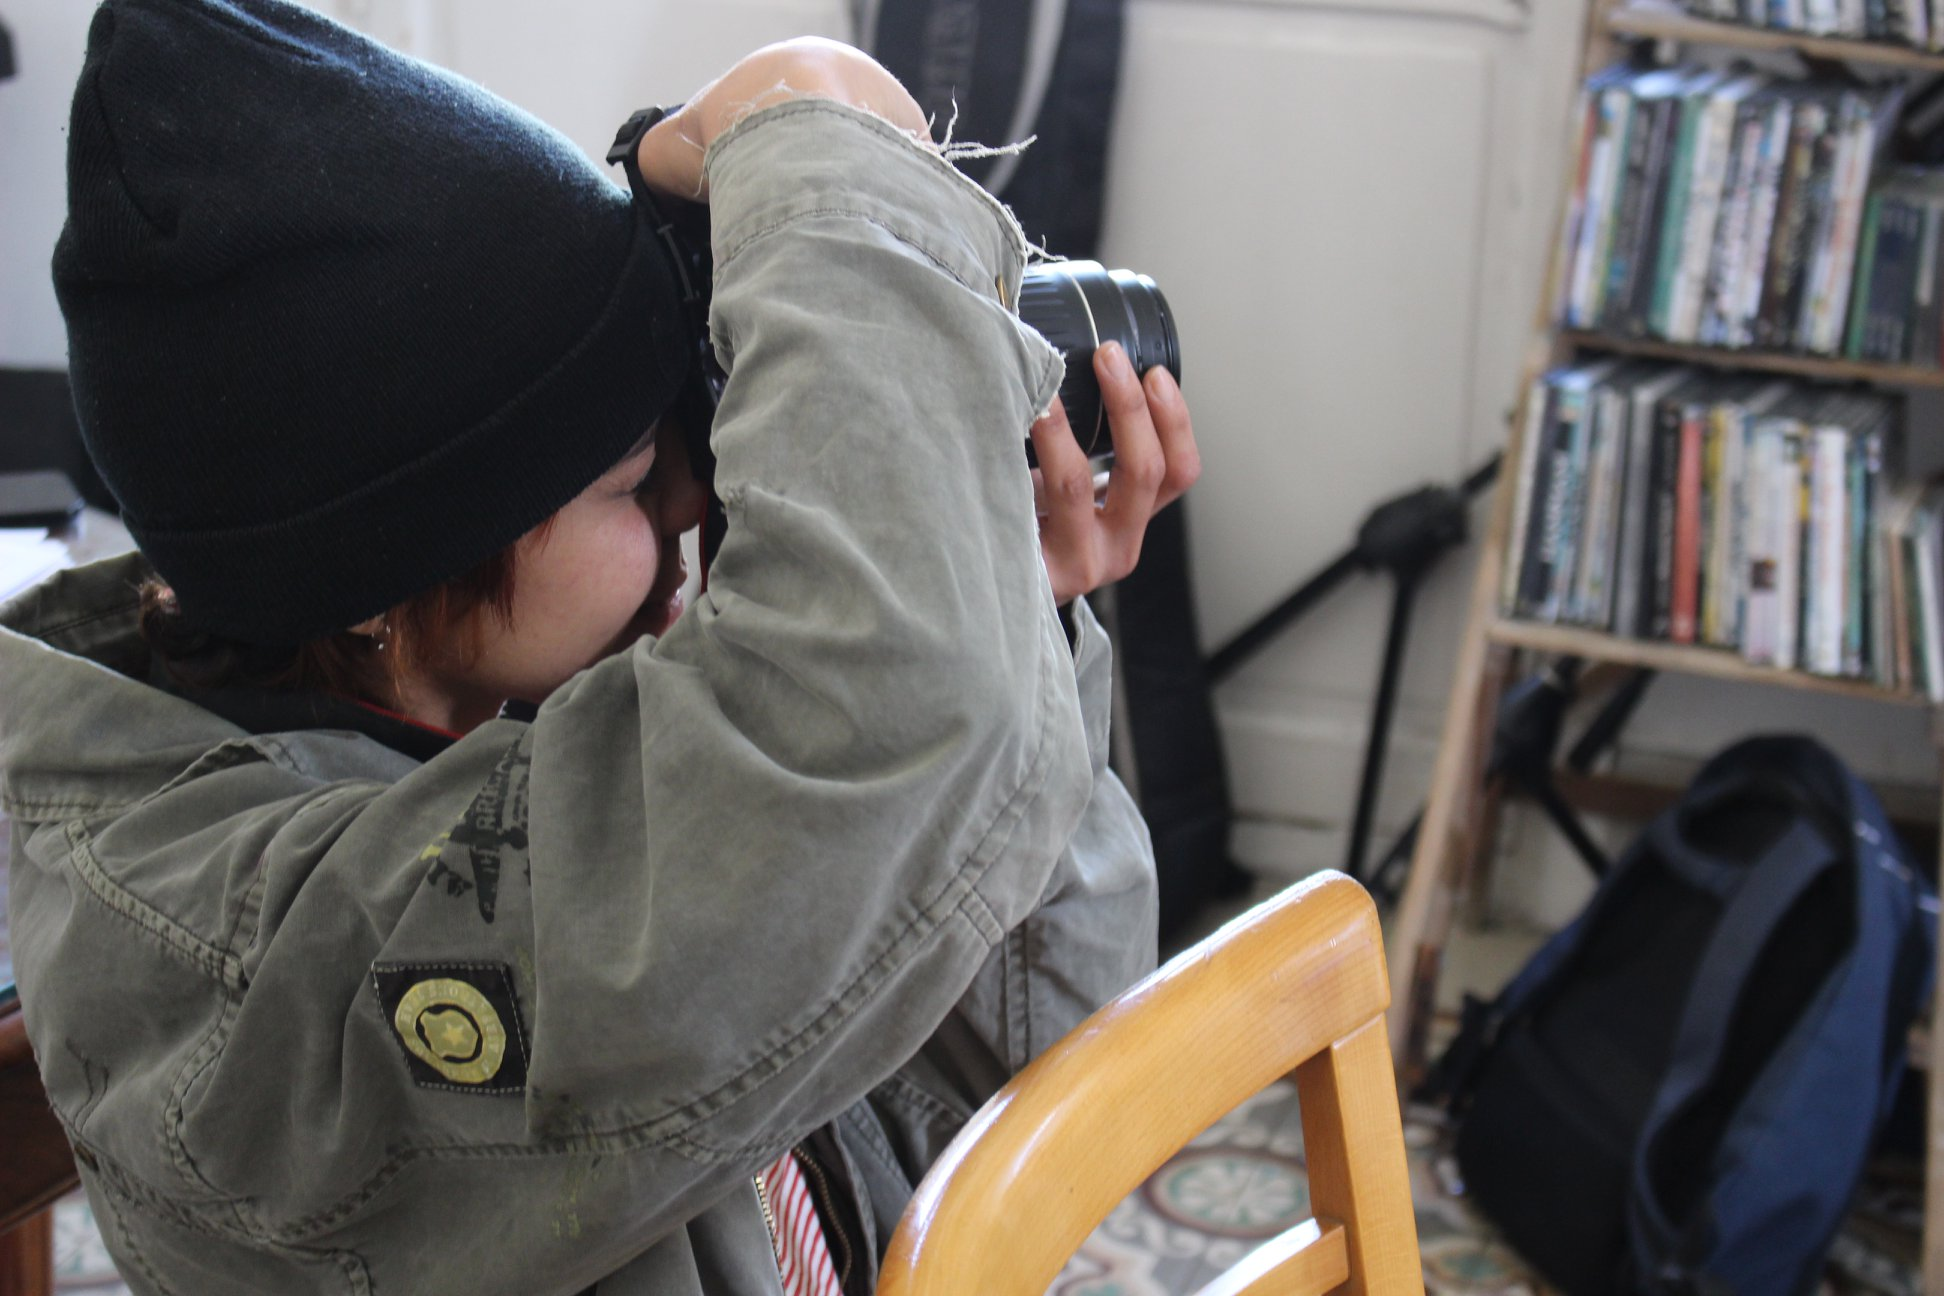 Making of et interviews